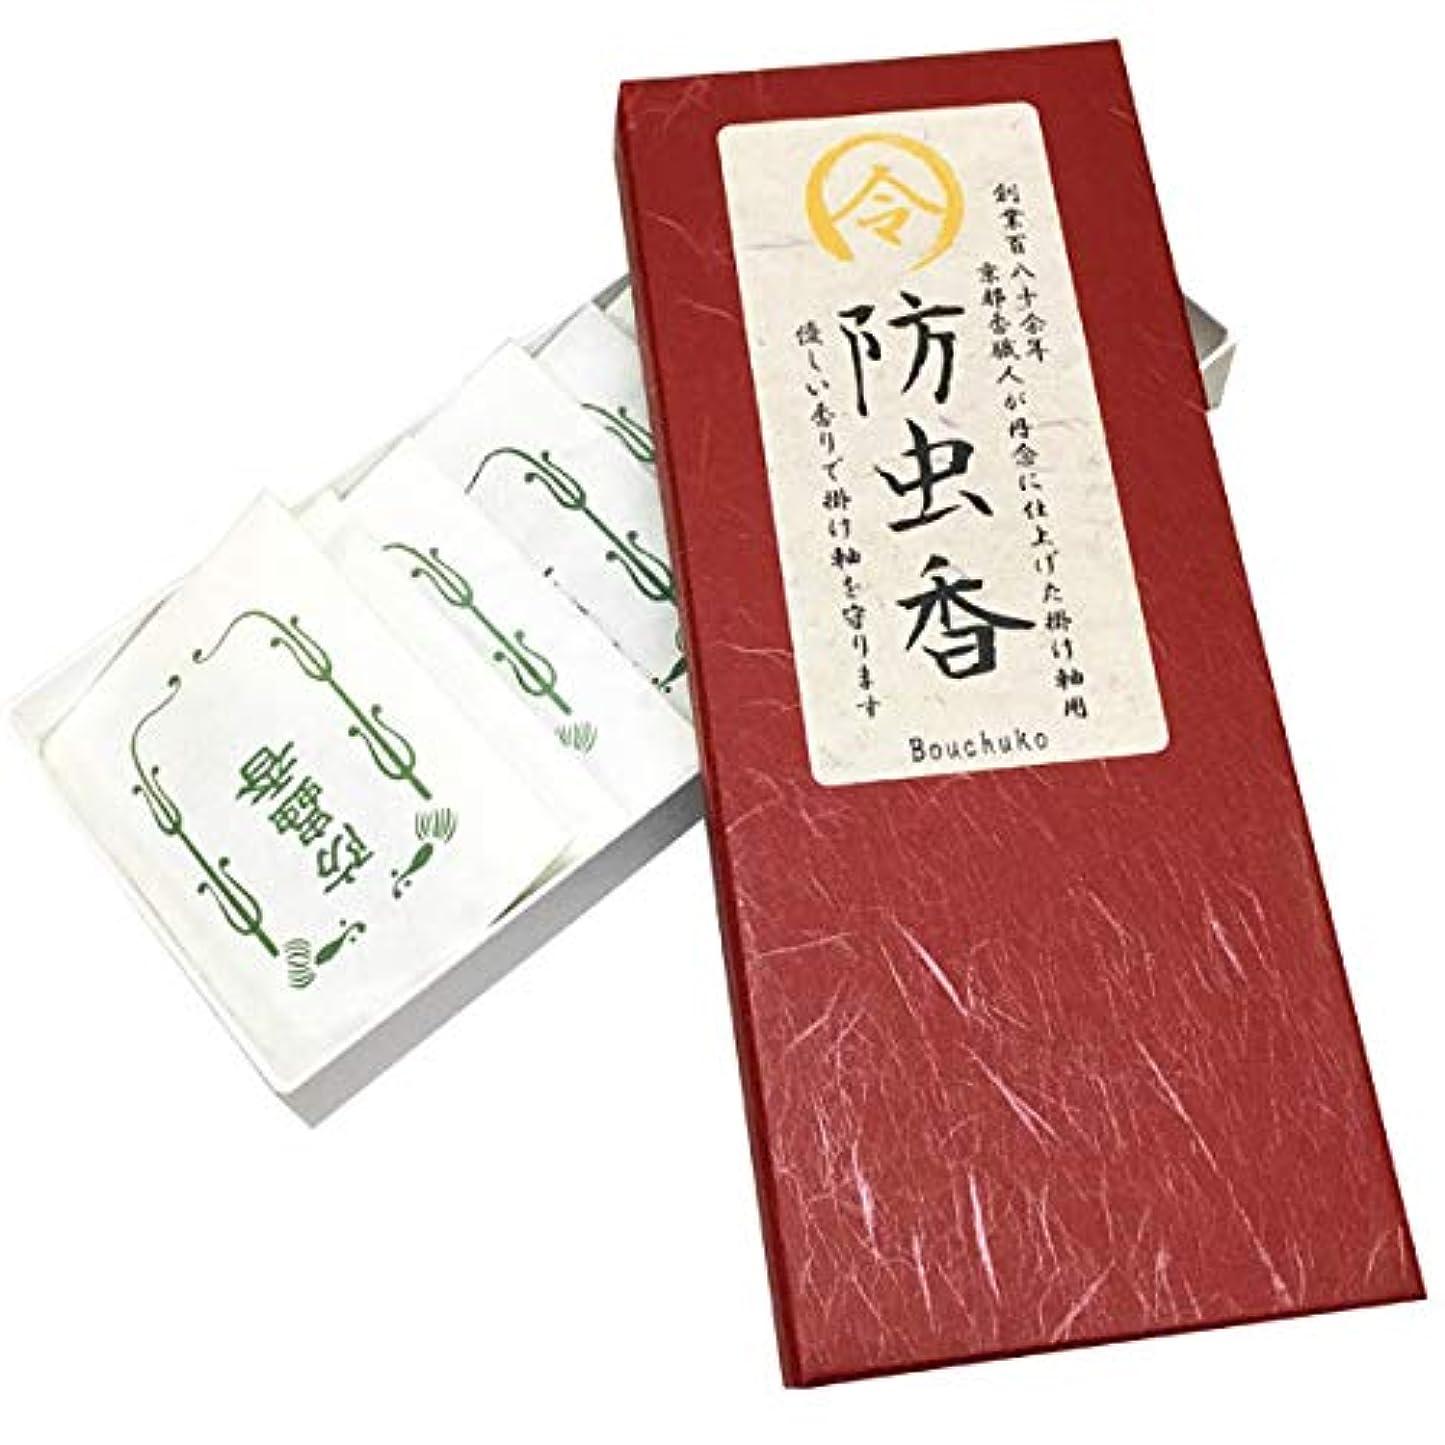 掛け軸用 表具用 高級香 令和印の掛軸防虫香(白檀香) 1箱10袋入り